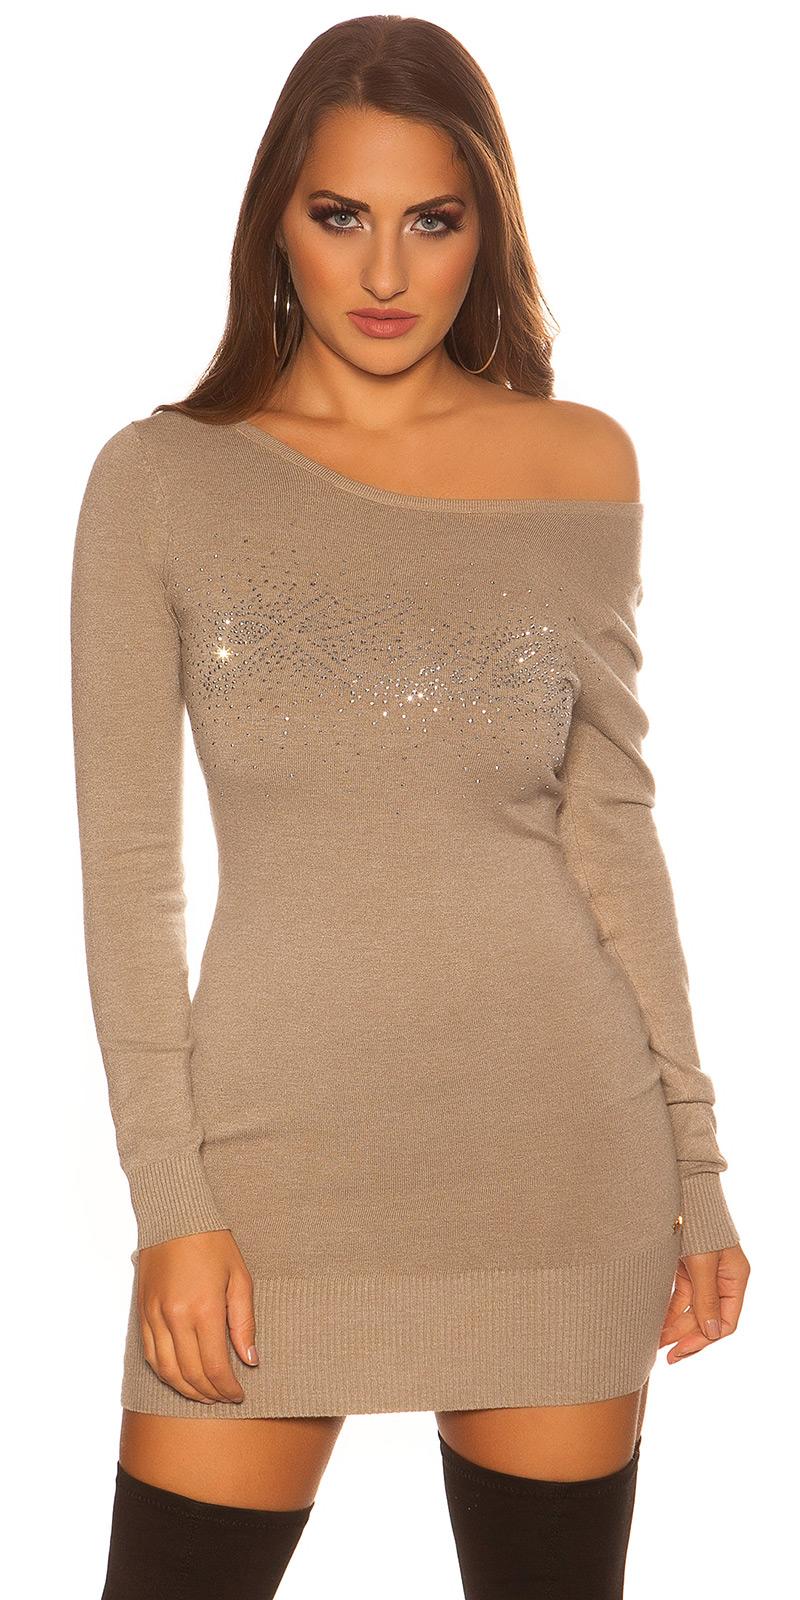 Šaty s dlouhým rukávem 0000ISF8266-N - Capuccino